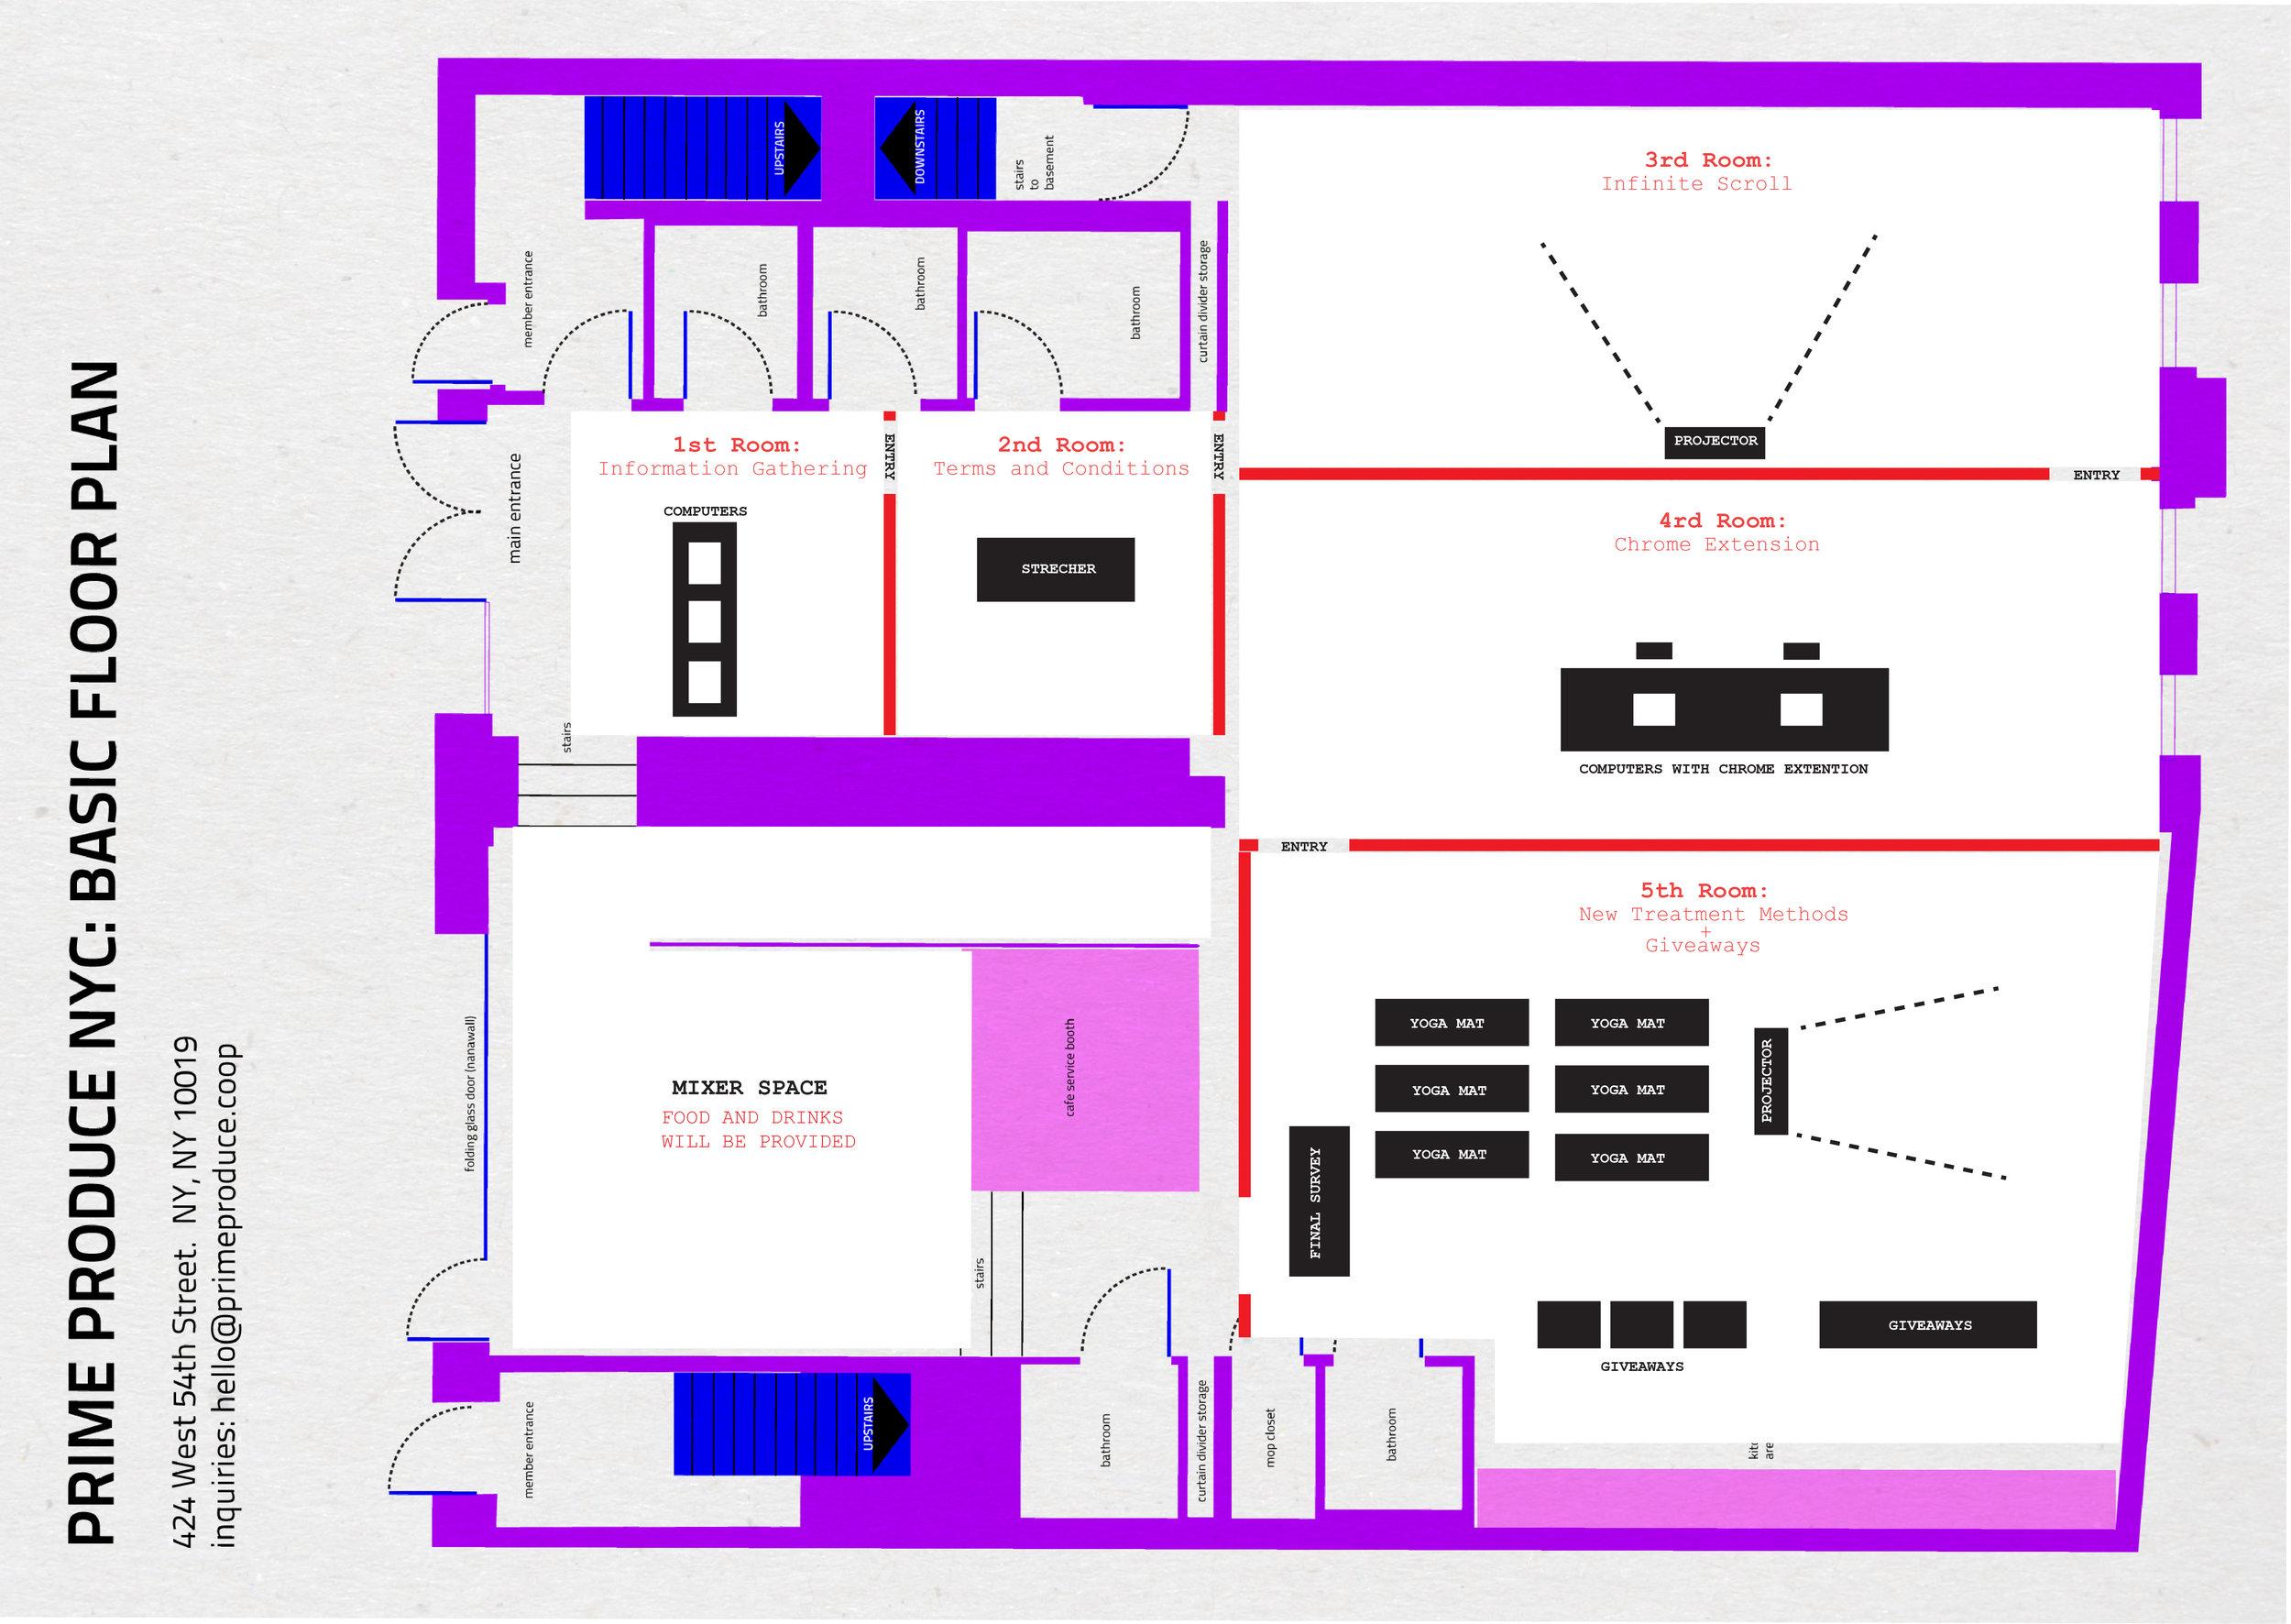 Prime-Produce-NYC-Basic-Floorplan.jpg